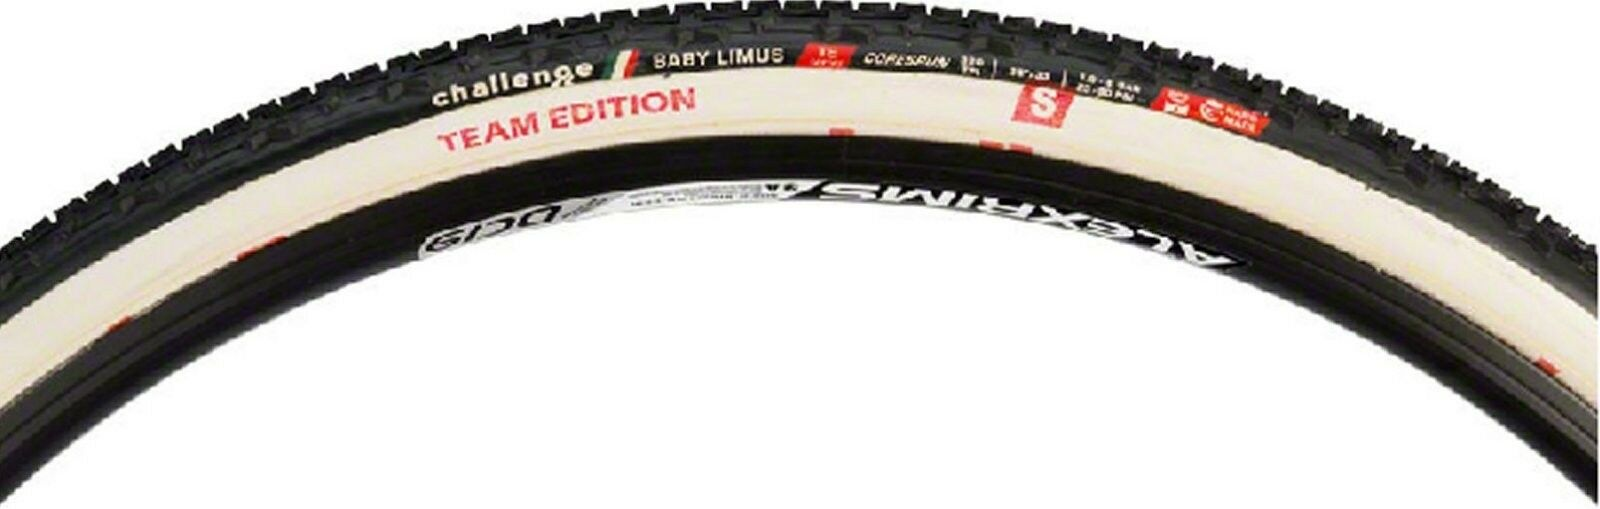 Challenge Baby Limus S Team Edition cyclocross tubular 700 x 33